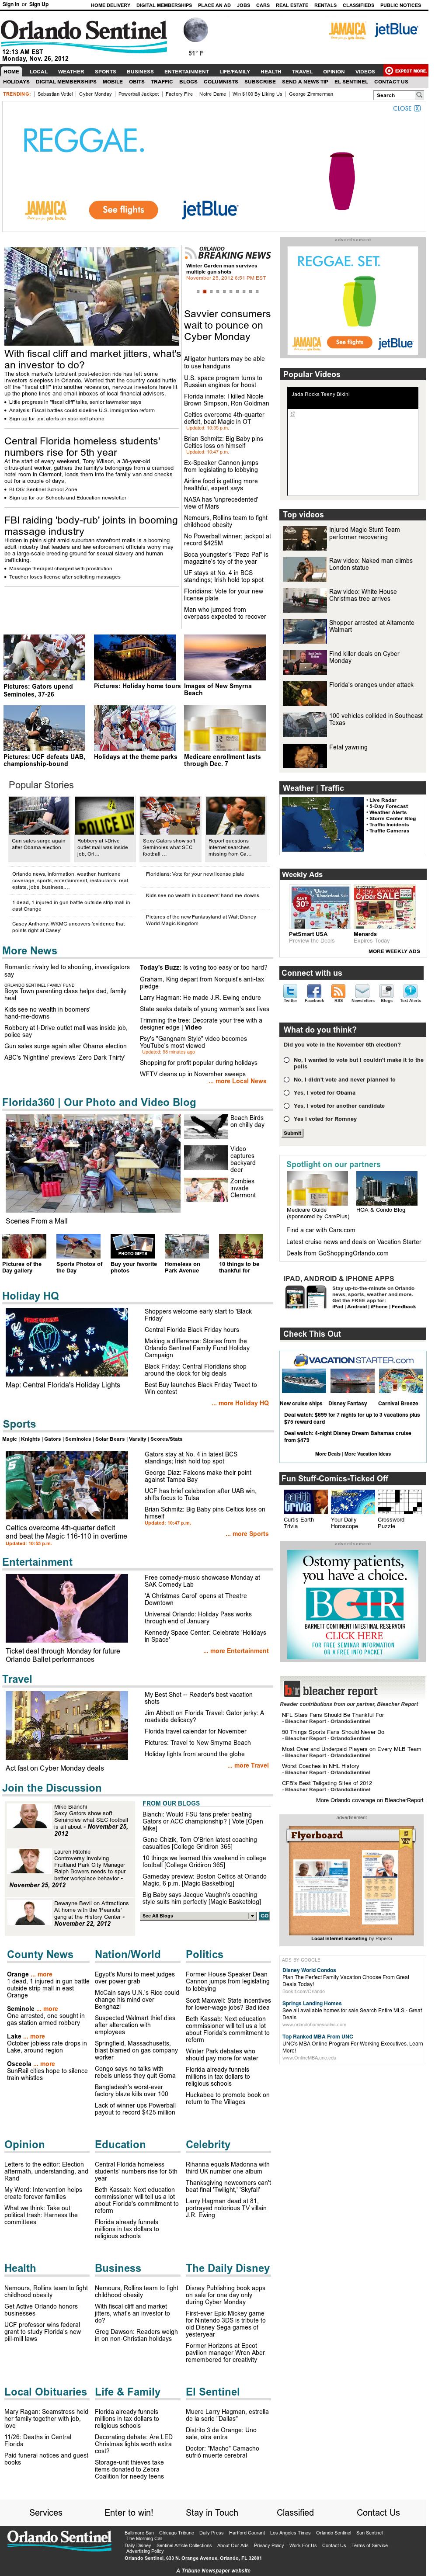 Orlando Sentinel at Monday Nov. 26, 2012, 5:21 a.m. UTC